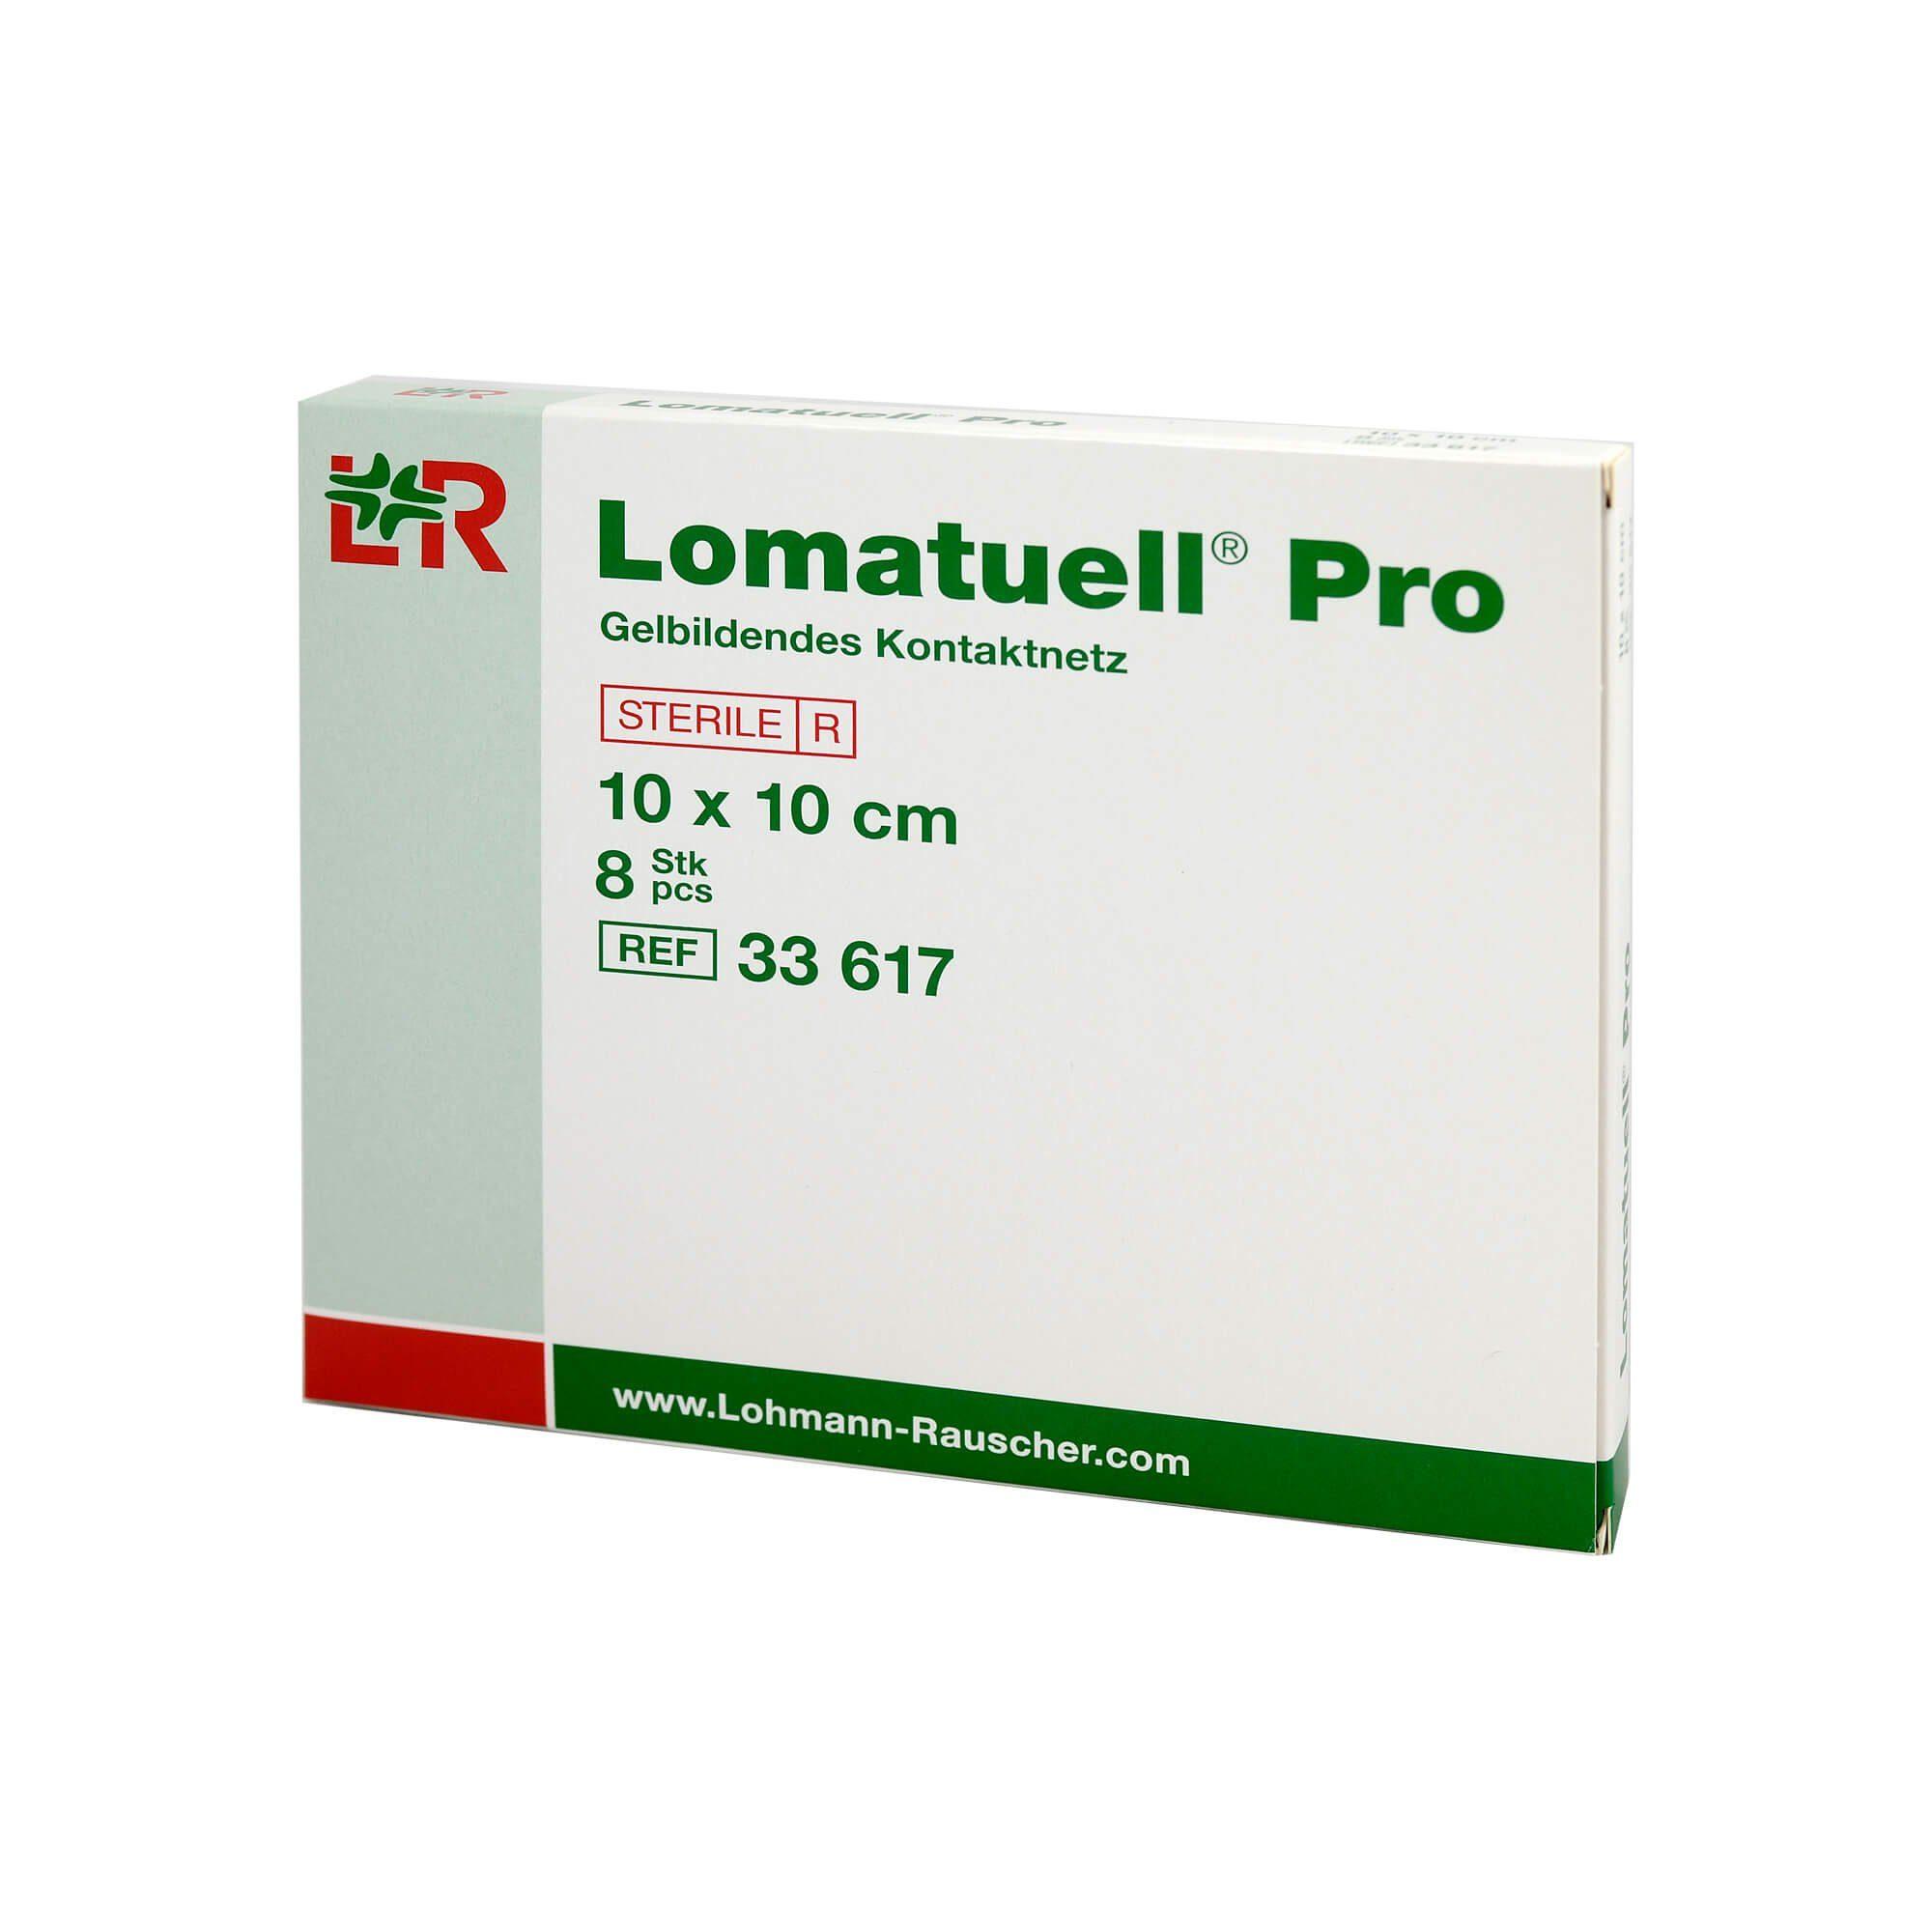 Lomatuell Pro Gelbildendes Kontaktnetz 10 cm x 10 cm, 8 St